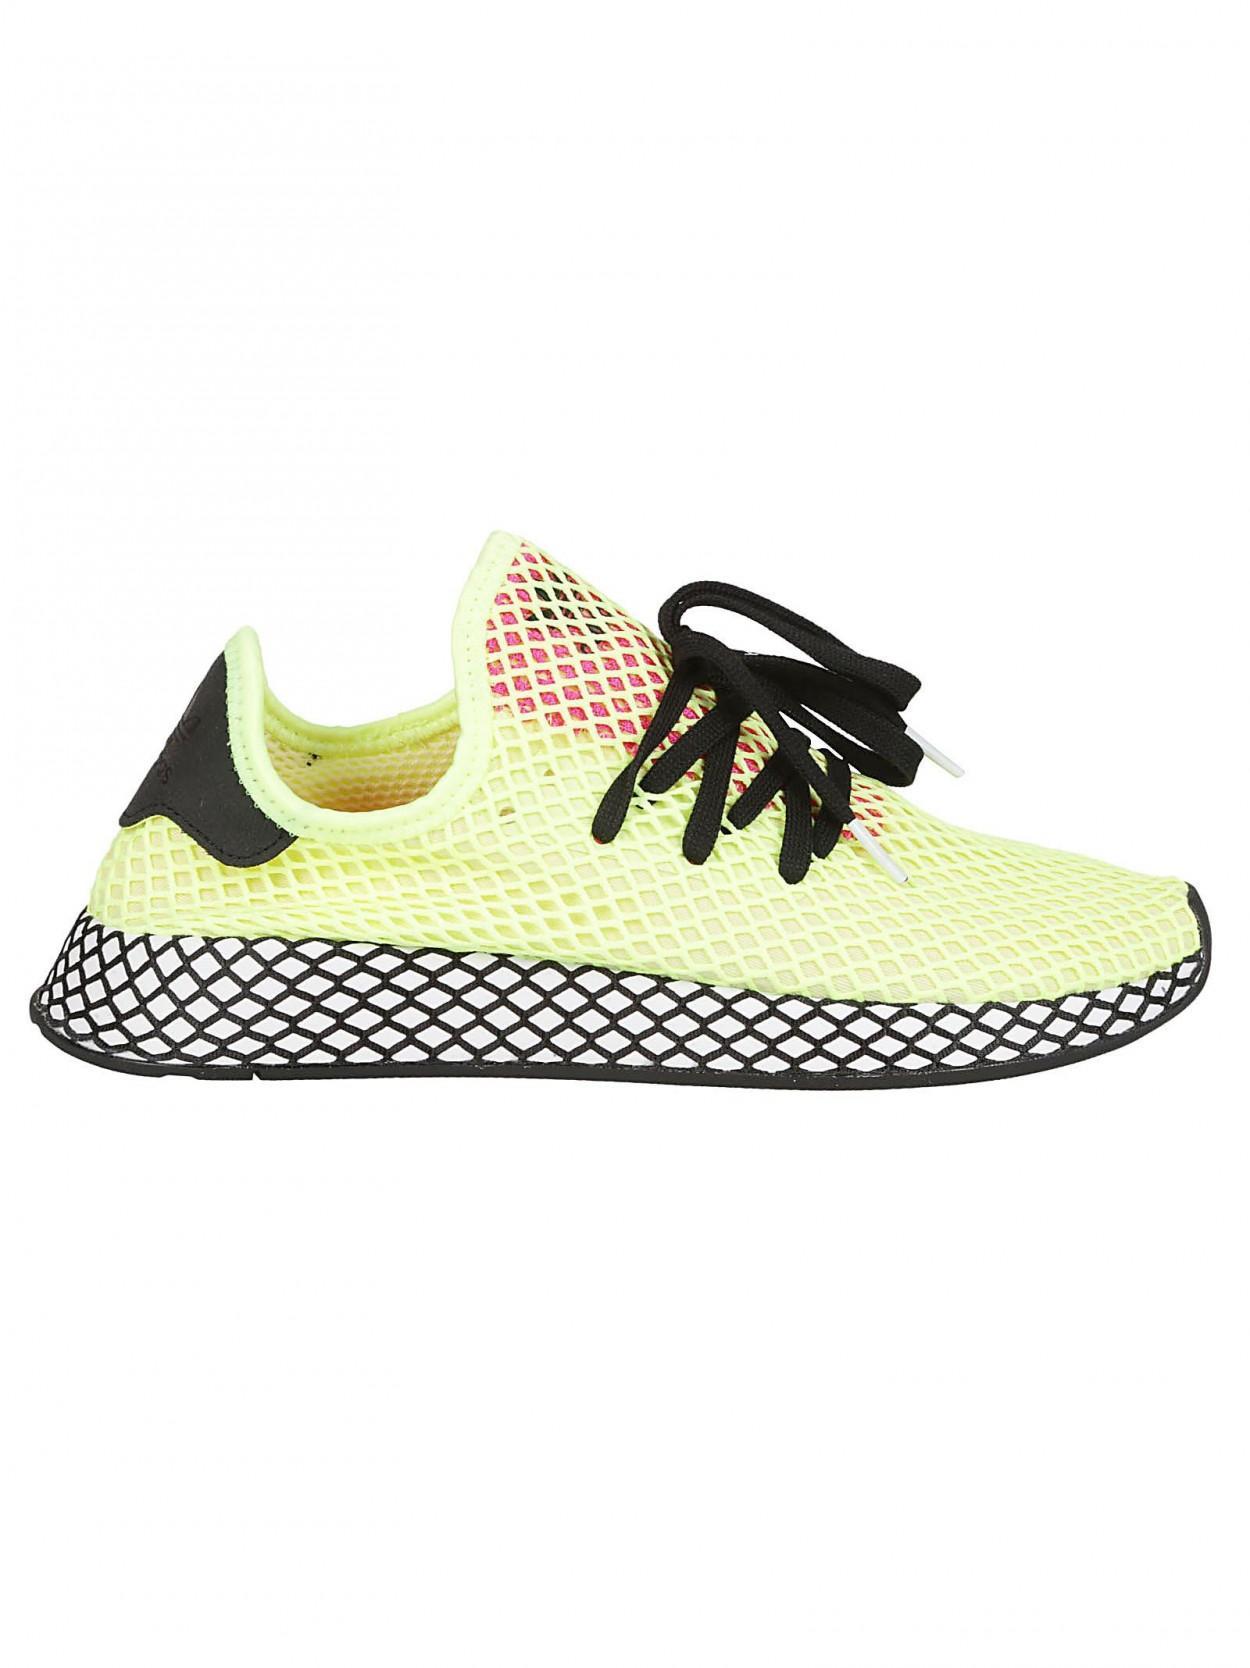 7ba8b040b adidas Originals. Men s ADIDAS ORIGINALS sneaker gialla deerupt runner